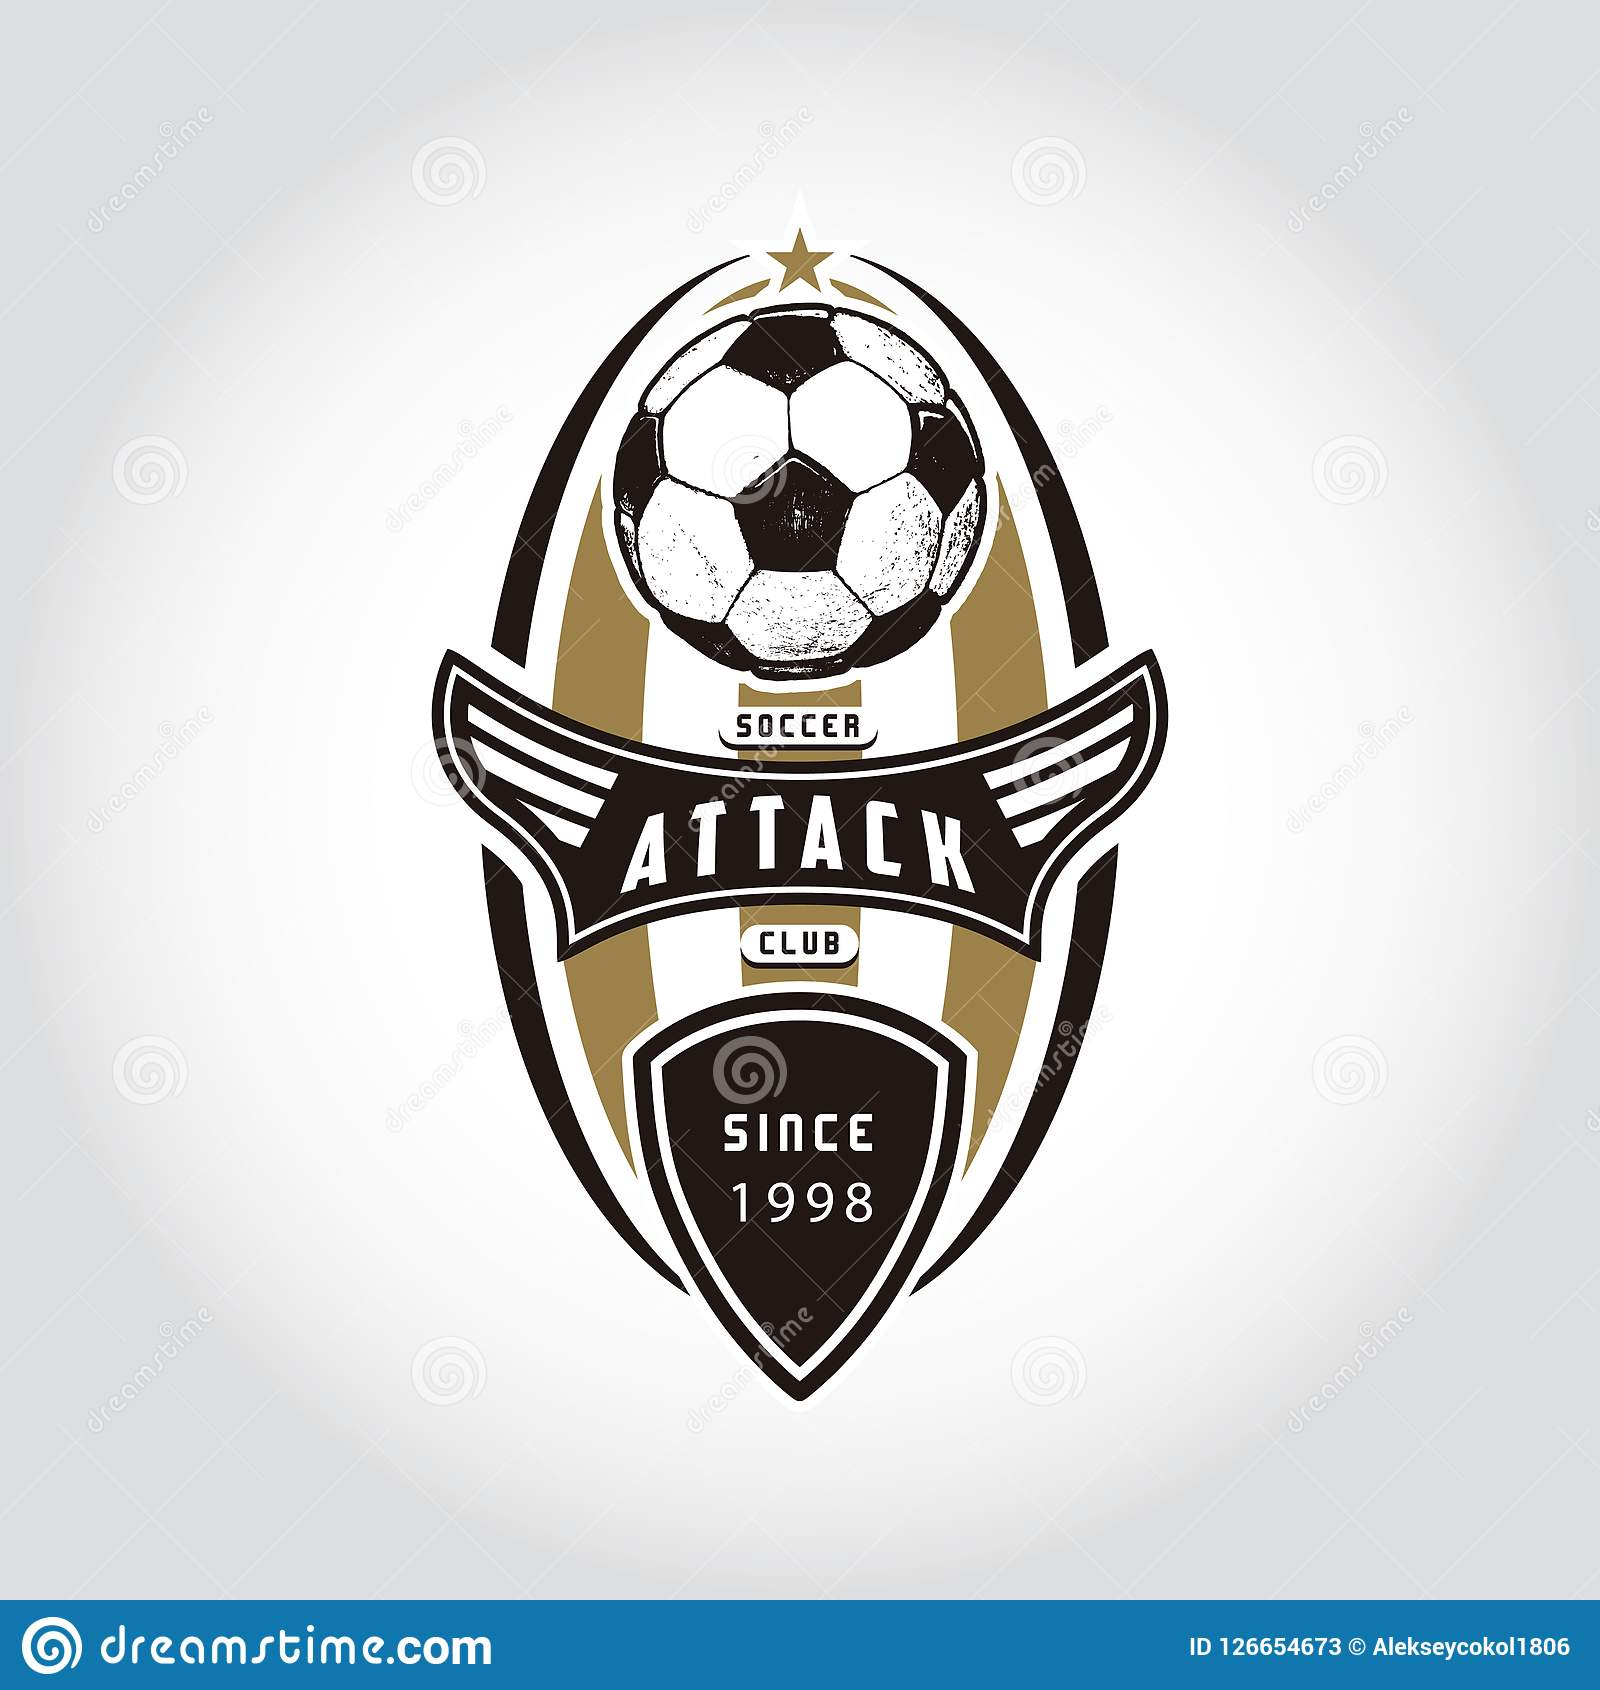 soccer badge logo stock vector illustration of american 126654673 https www dreamstime com soccer badge logo soccer badge logo handmade football ball sport team identity vector illustrations isolated white background image126654673